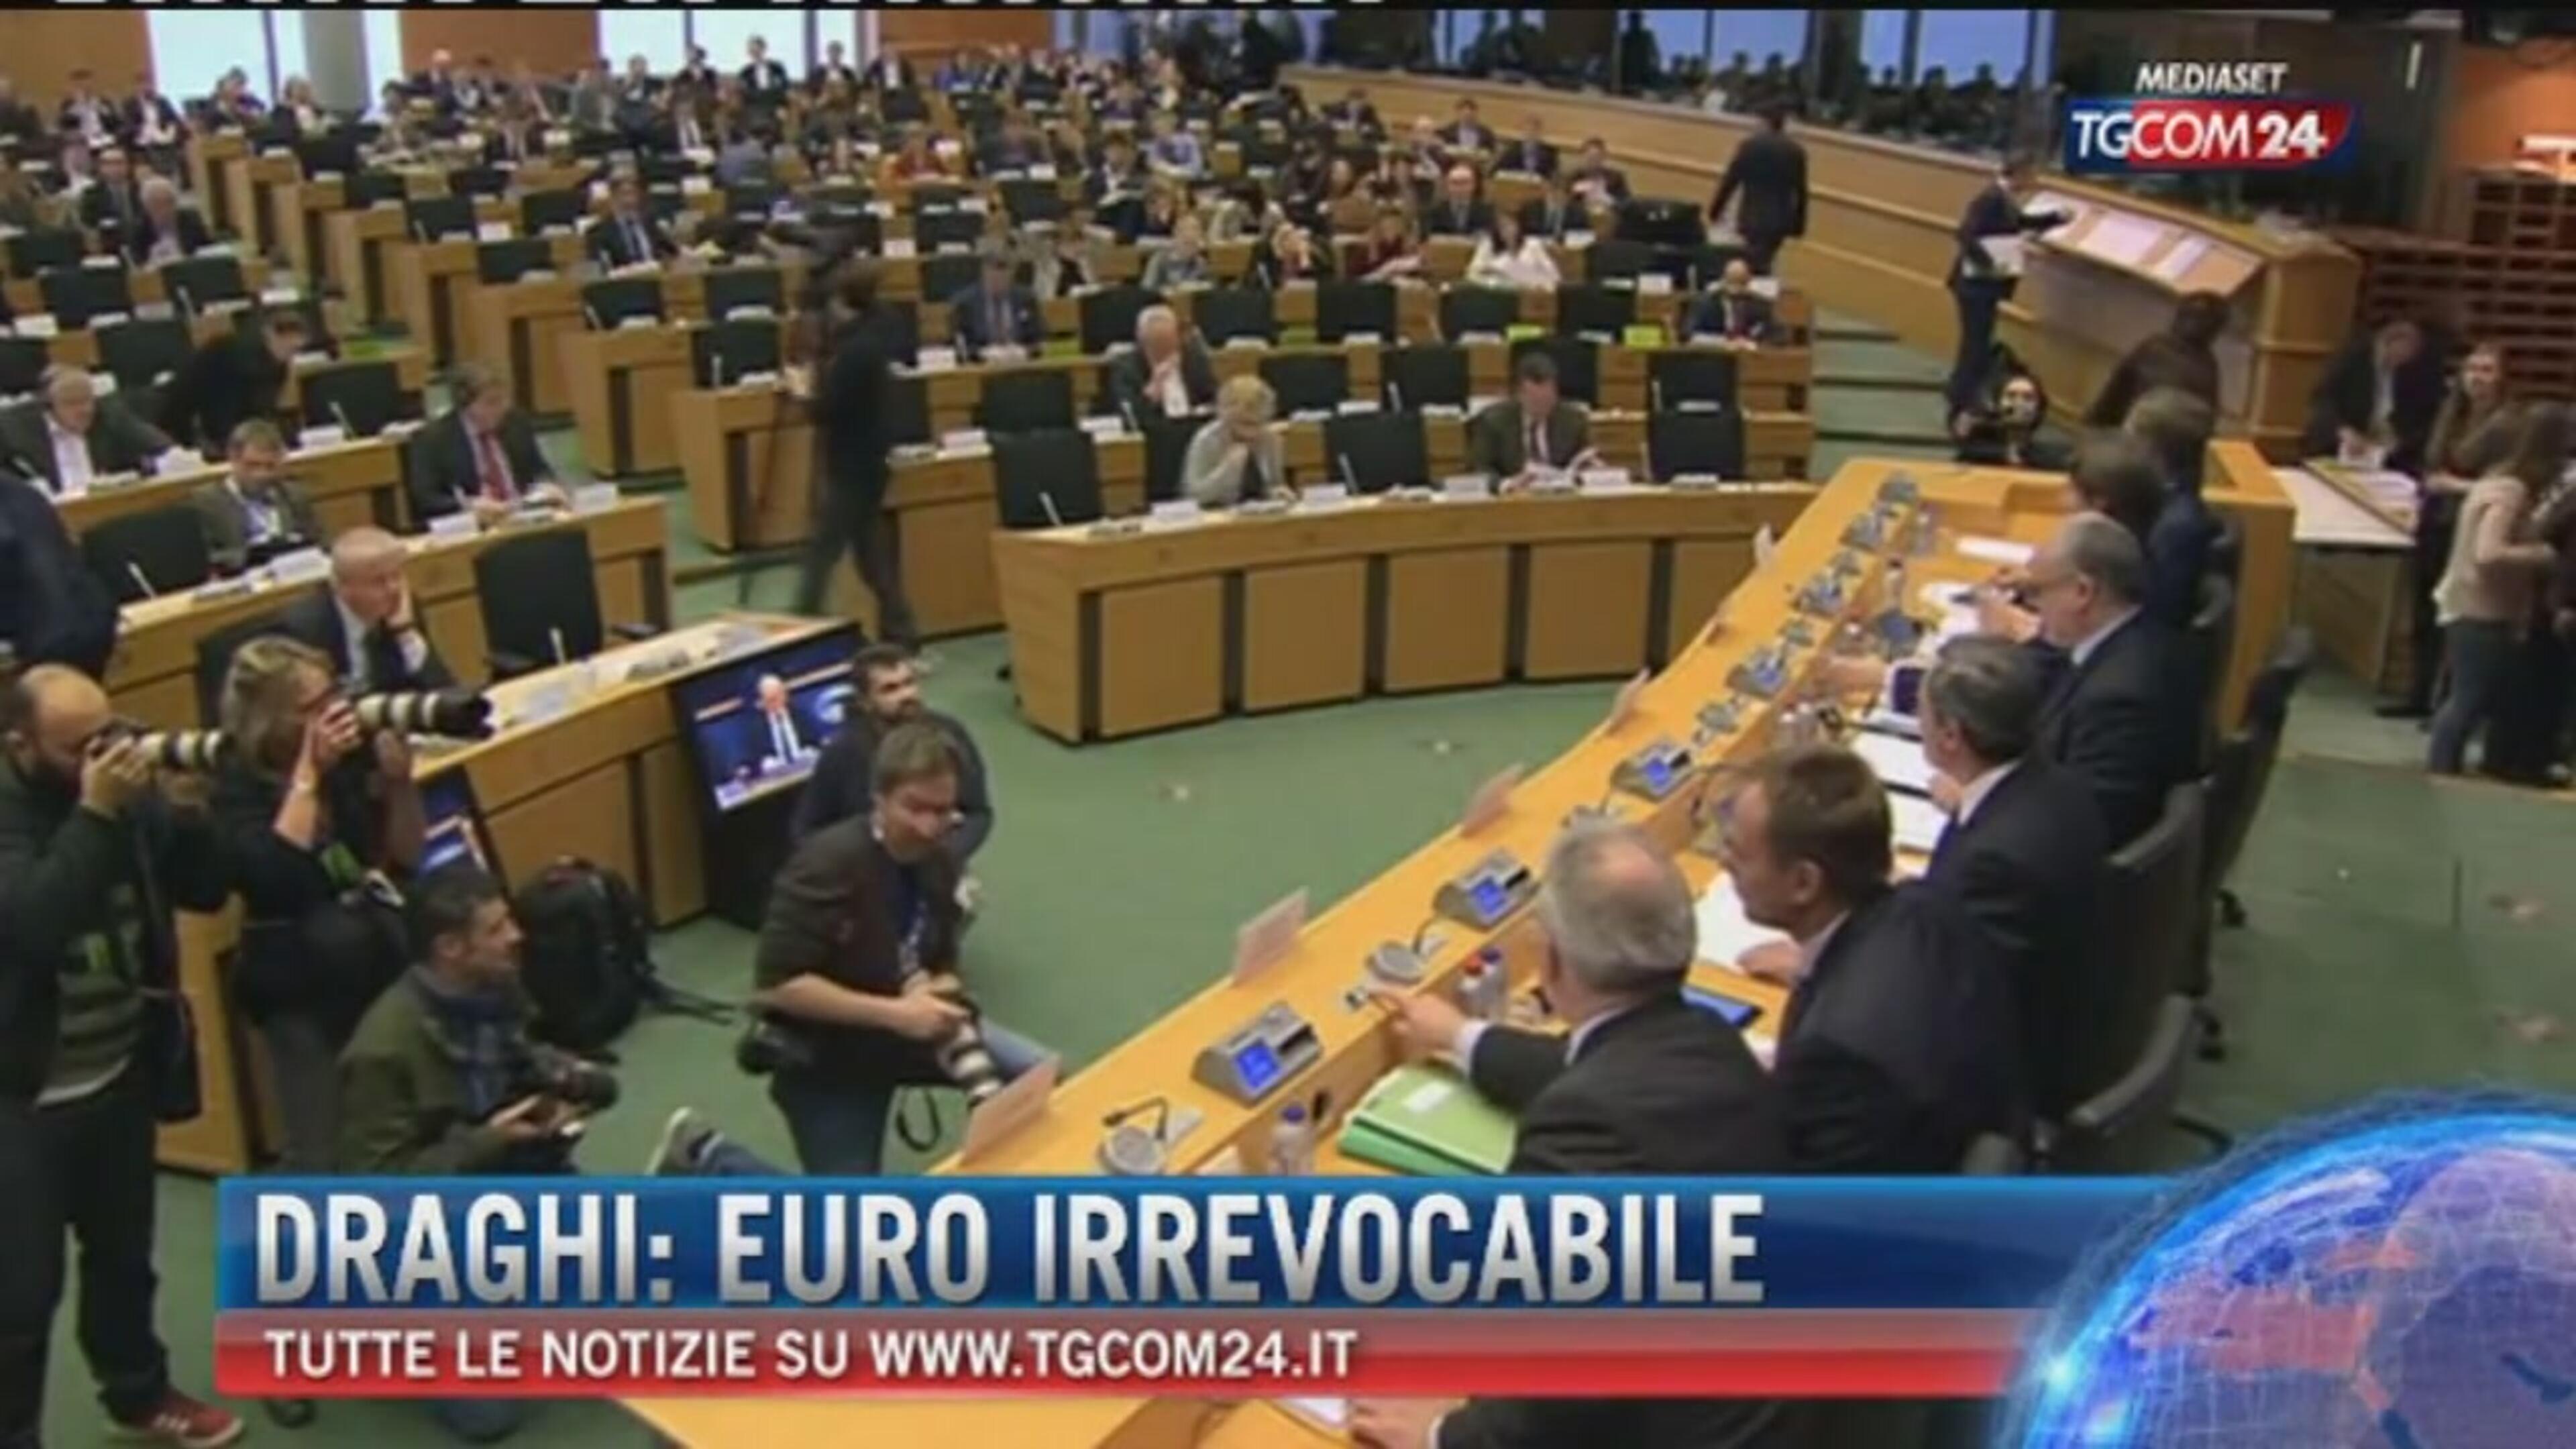 Draghi: Euro irrevocabile